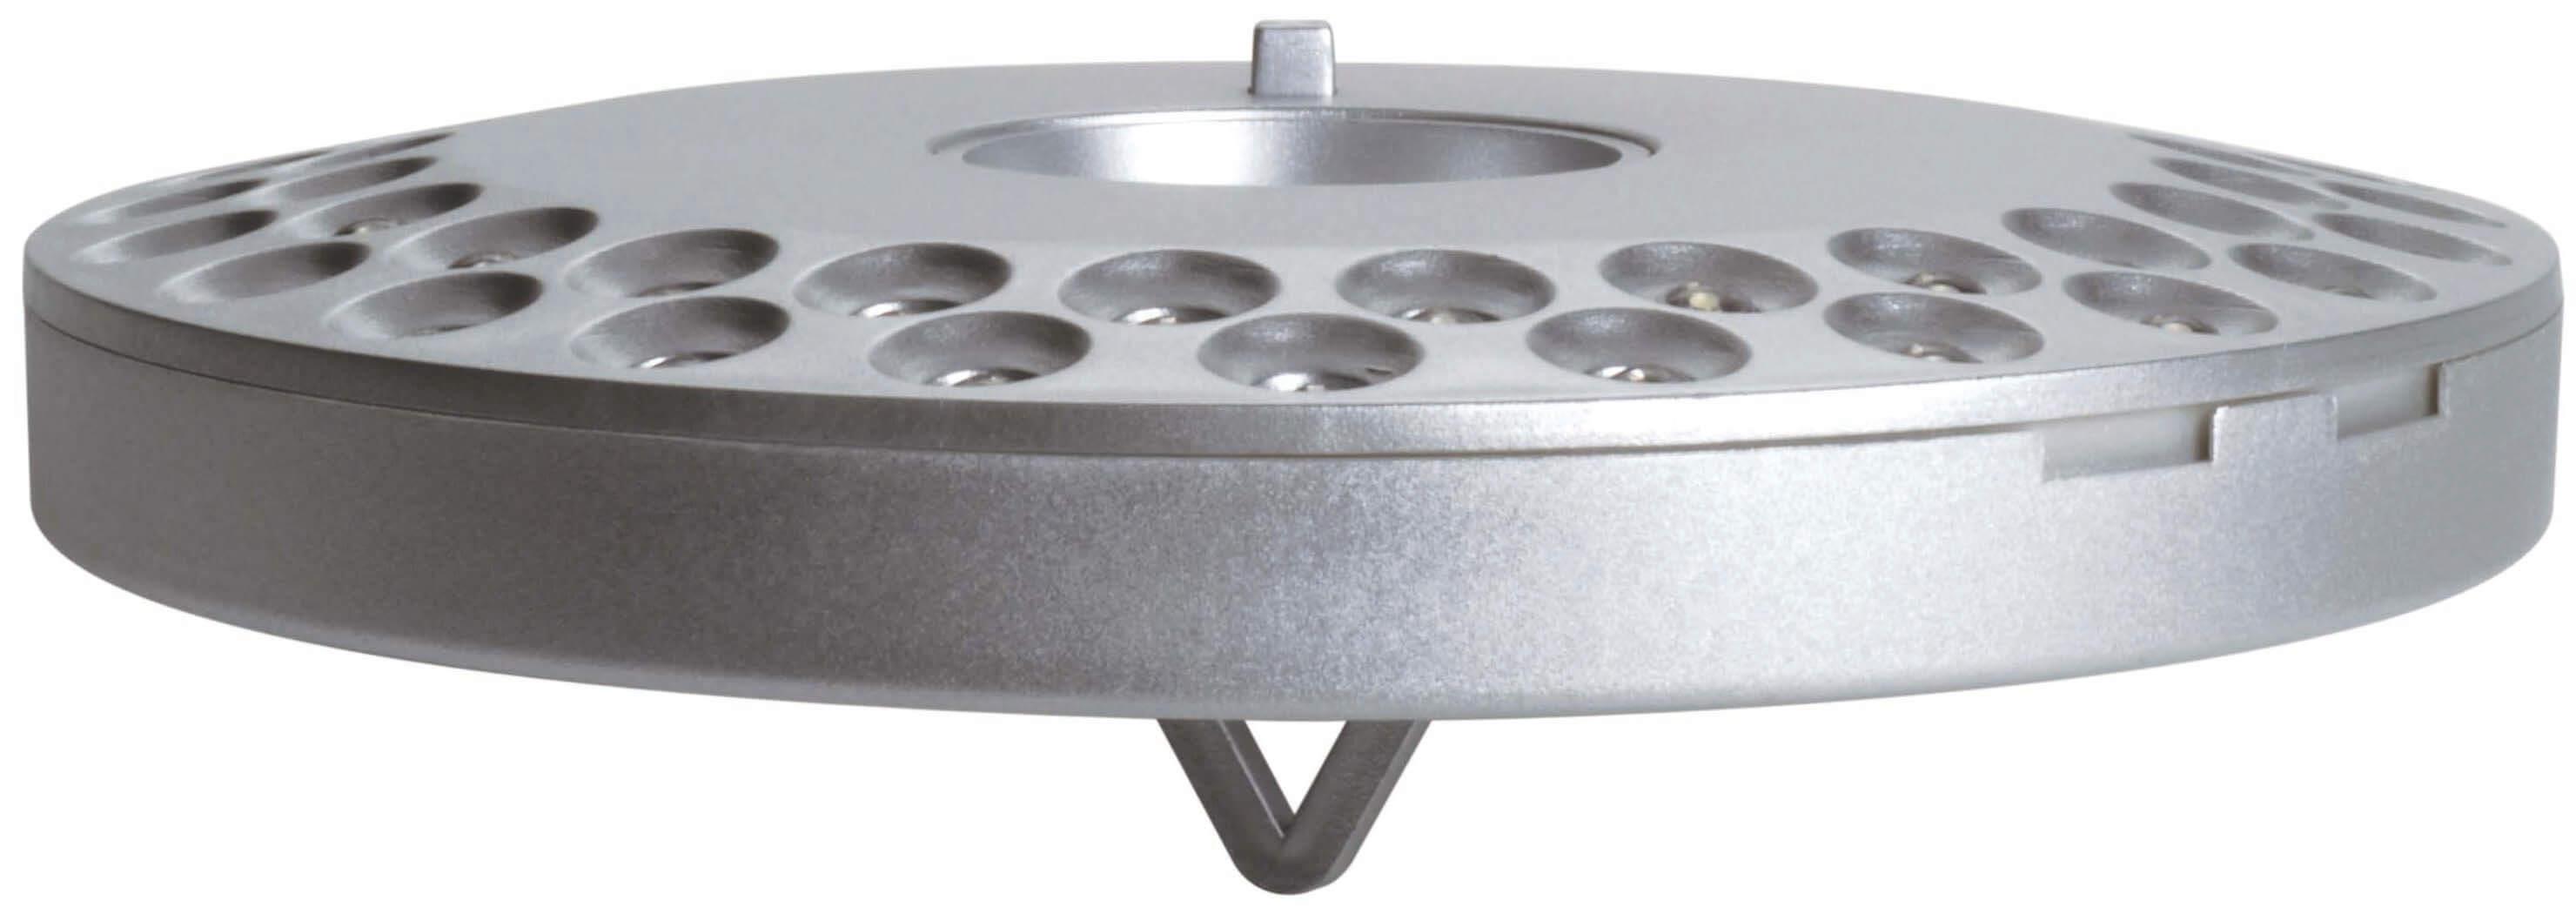 obsoletoLUZ MODELO UFO/KIRK PL135 LED FRE 48 BAT GRIS INT